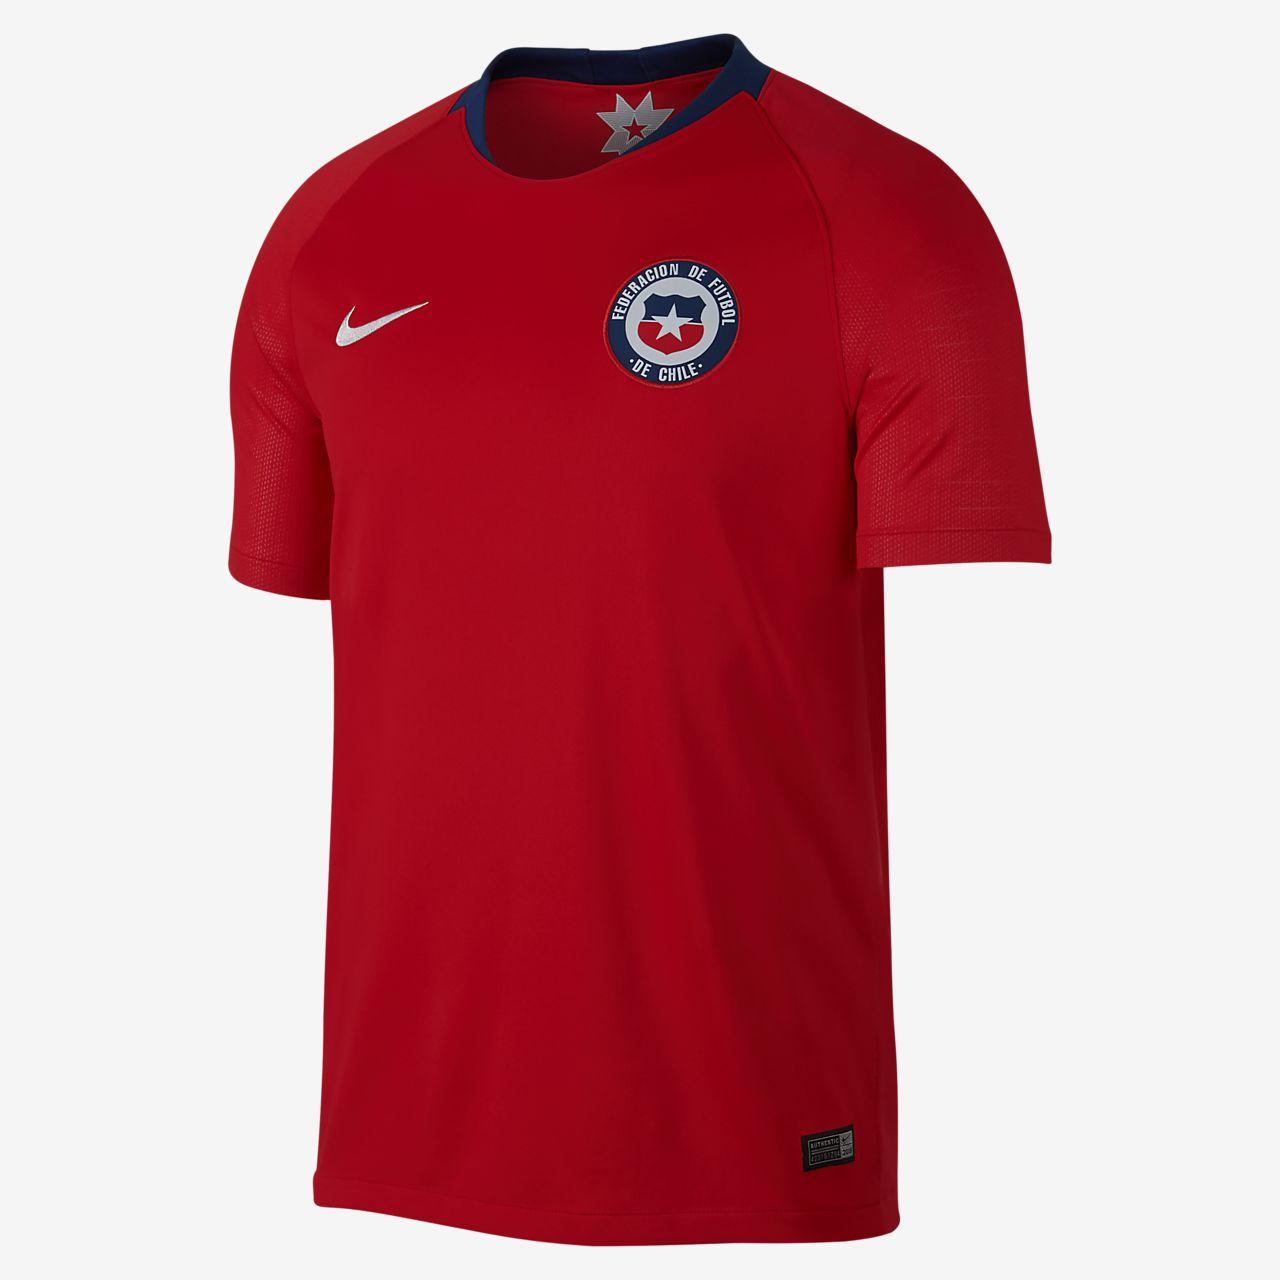 2018 Chile Stadium Home Men's Football Shirt